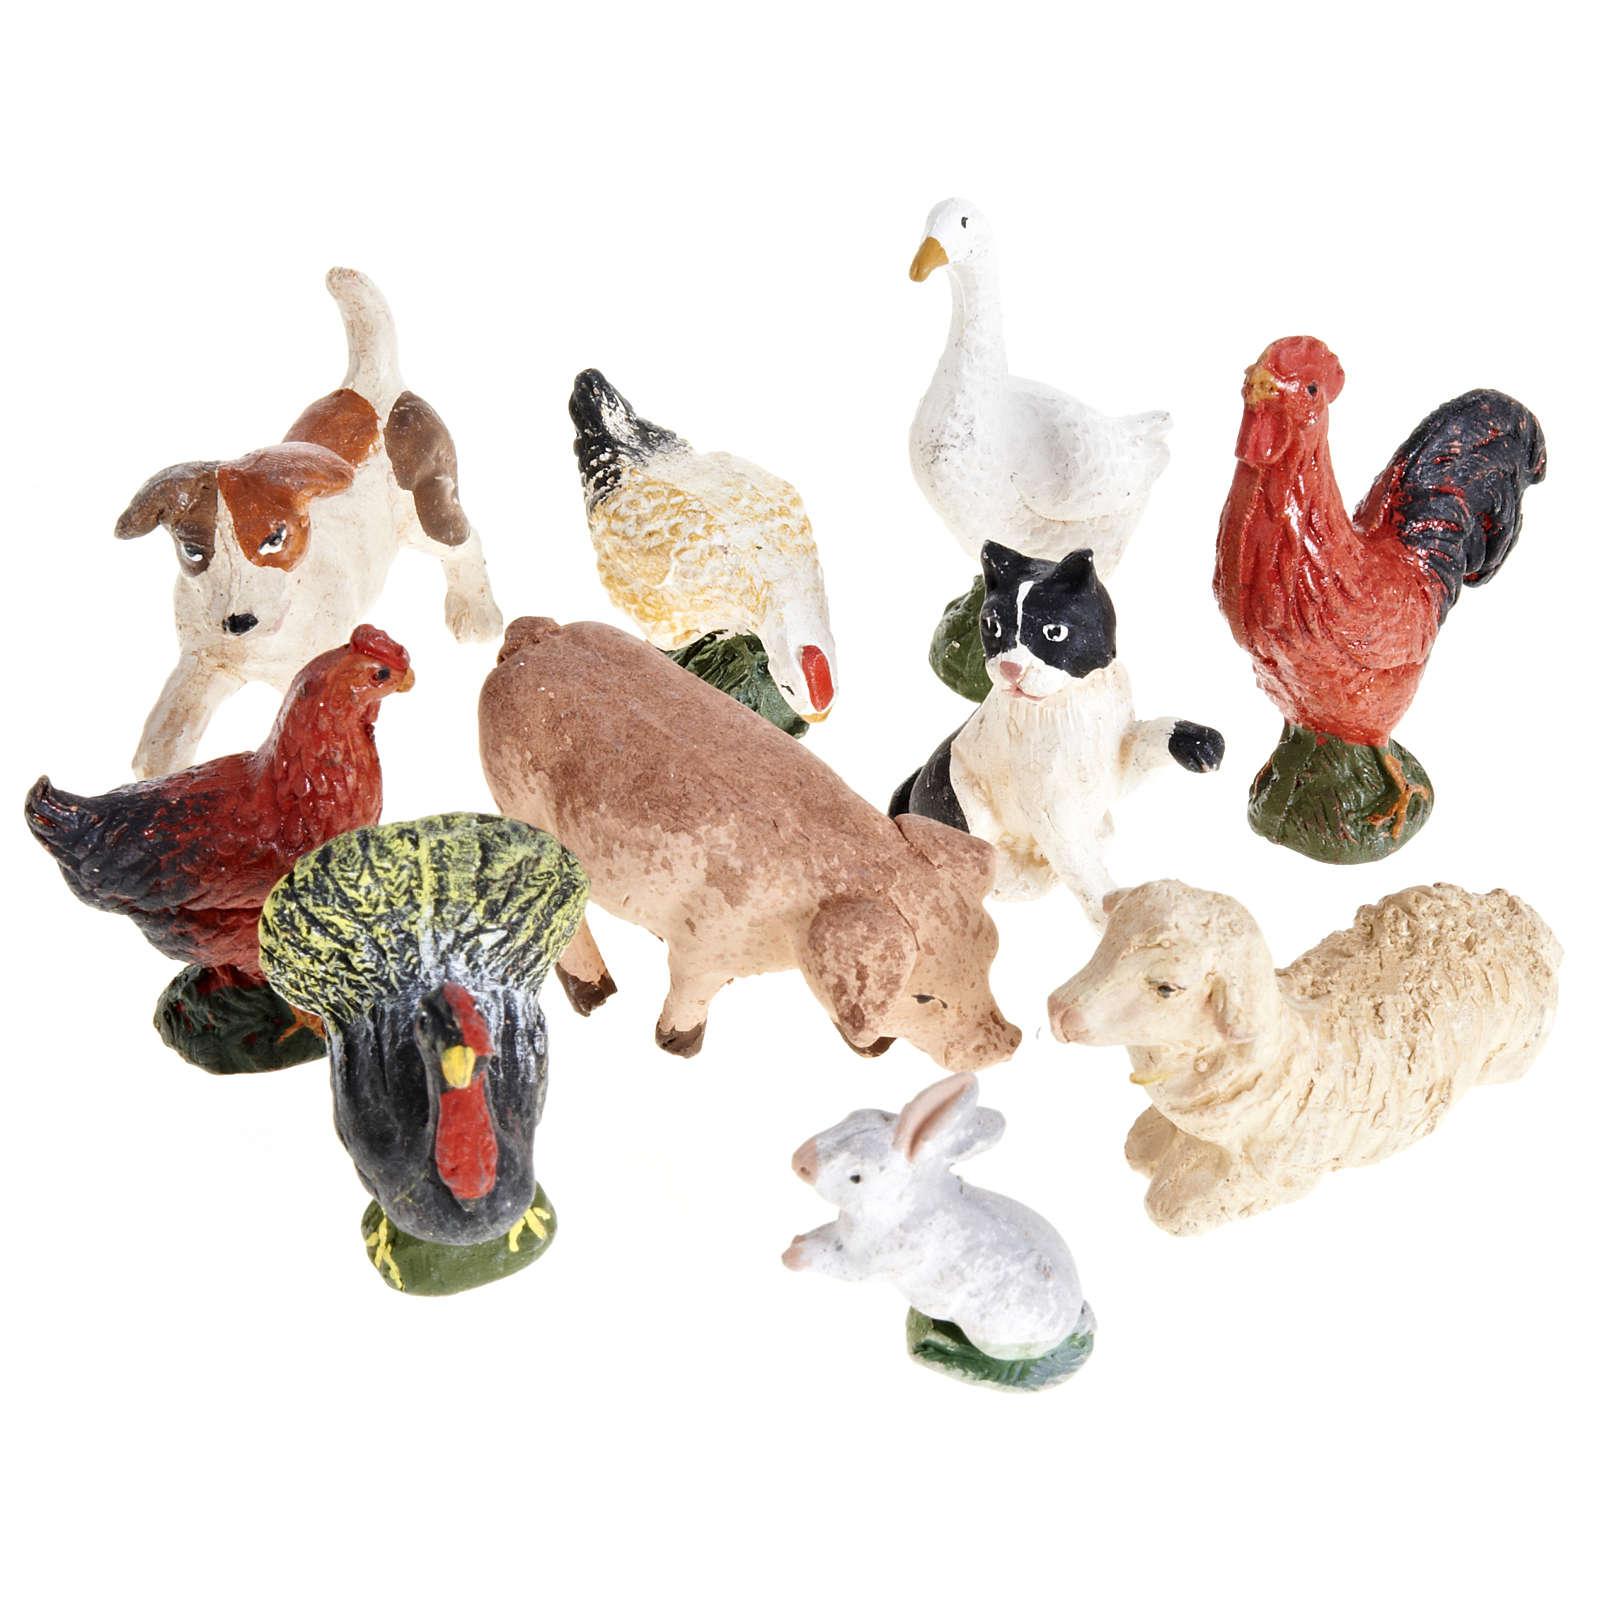 Nativity scene accessory courtyard animals 10 pcs 10cm 4